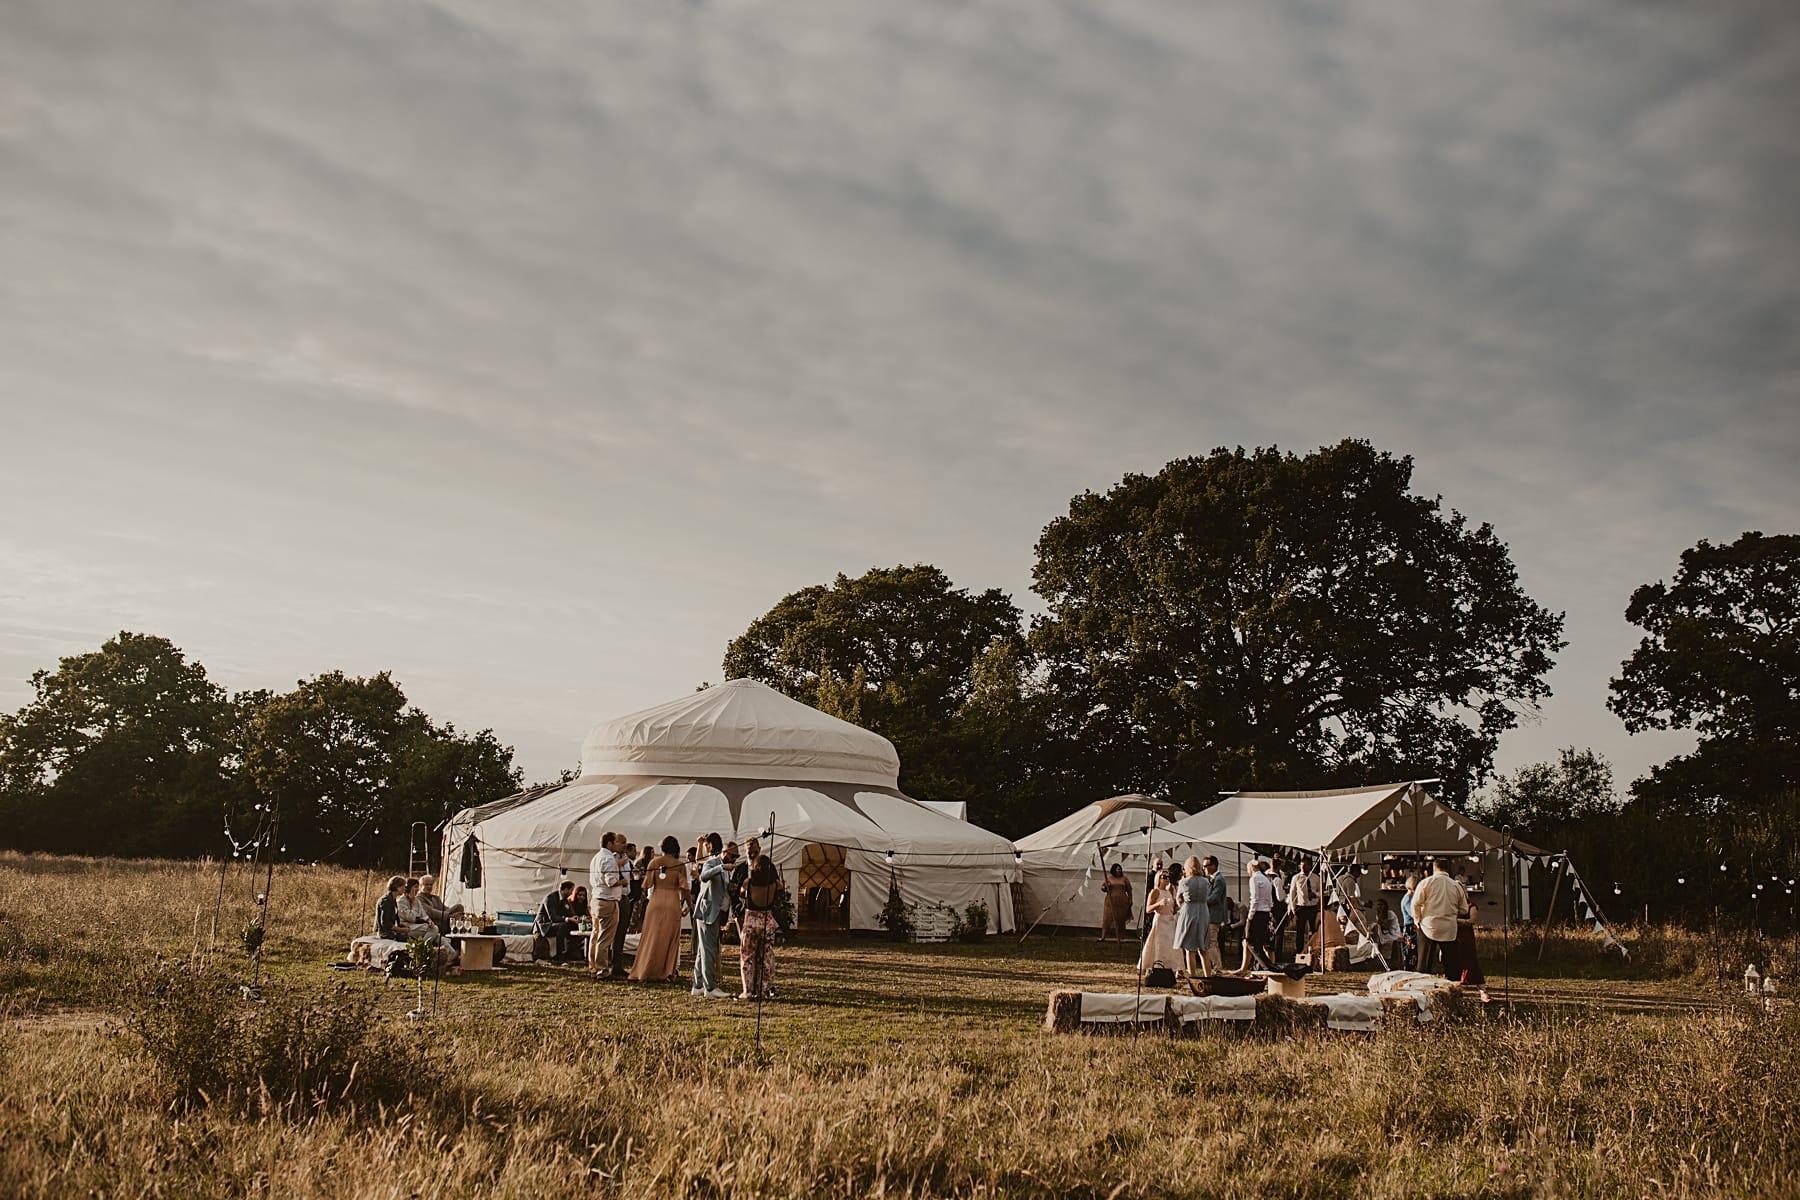 Yurt in meadow sunset